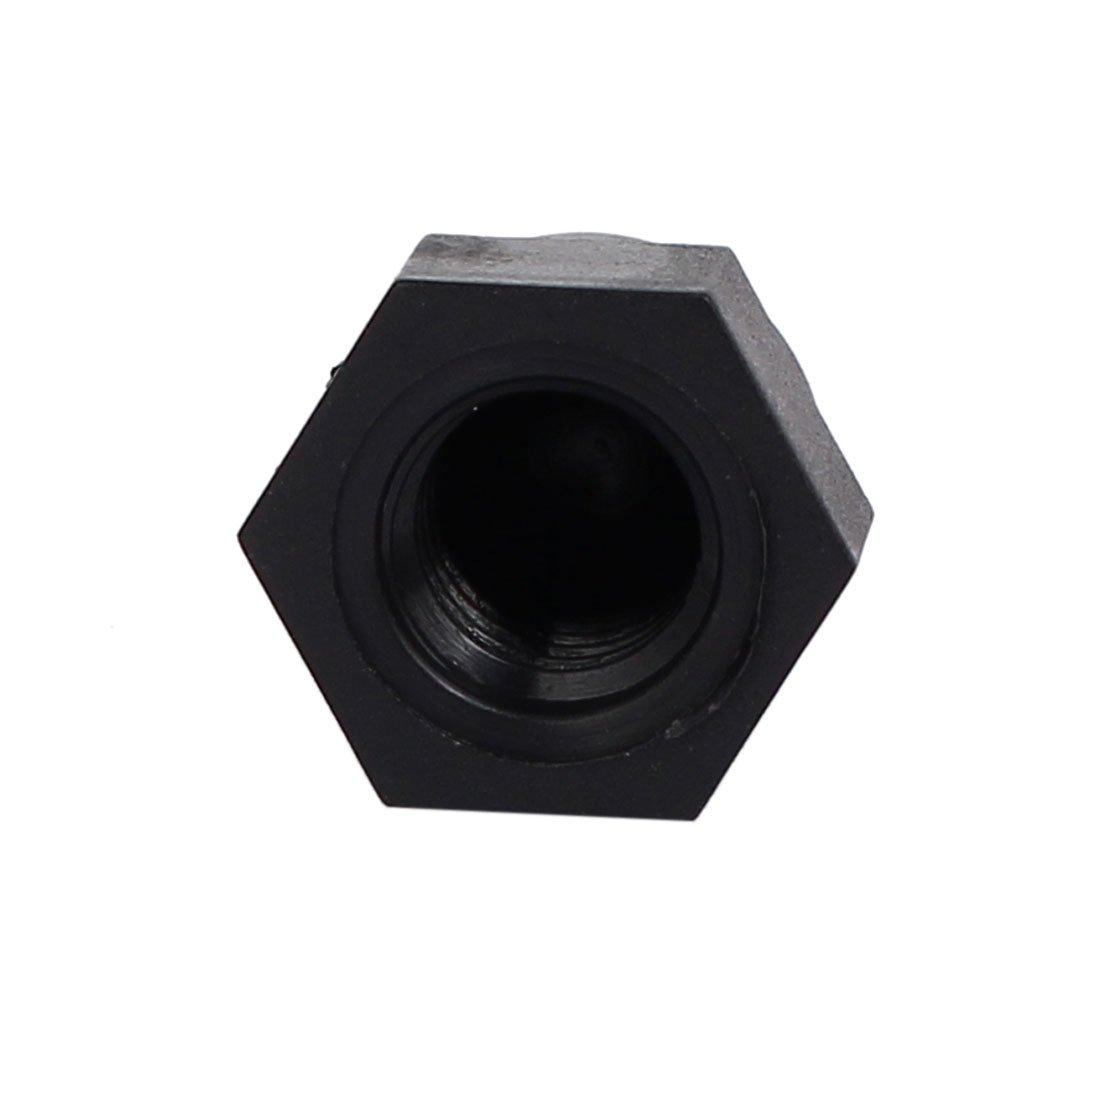 gazechimp 10 Pcs M10 17x20mm Black Dome Bolt Nut Protection Cap Cover for Hexagon Screw